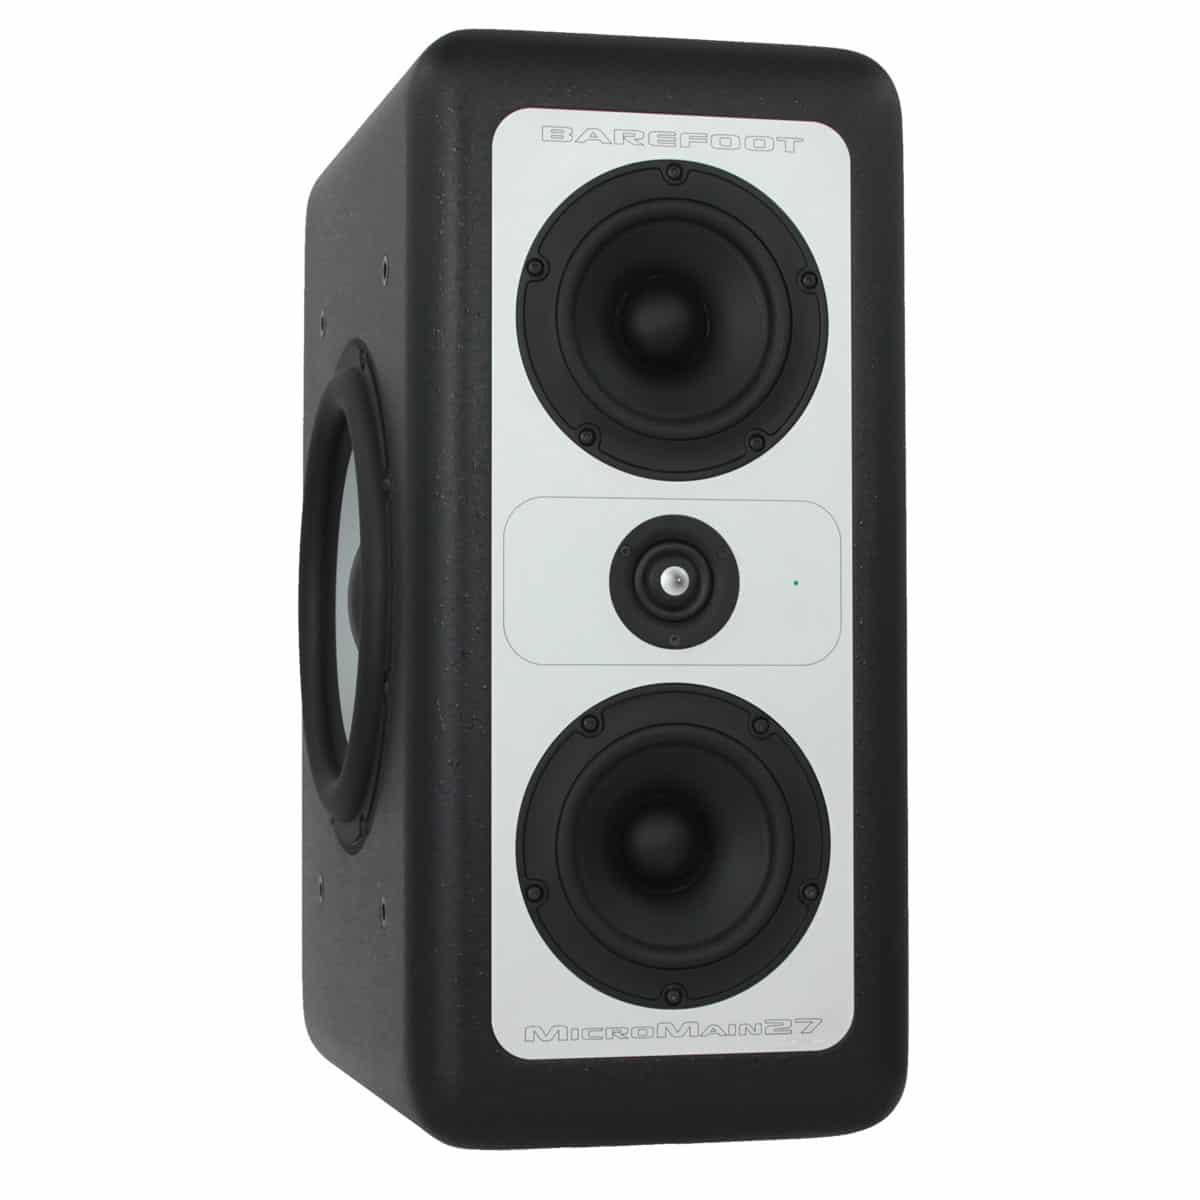 Barefoot Sound MicroMain 27 Gen2 Pro Audio, Audio Monitors, Studio Monitor Barefoot Sound Micromain 27 Gen2 3